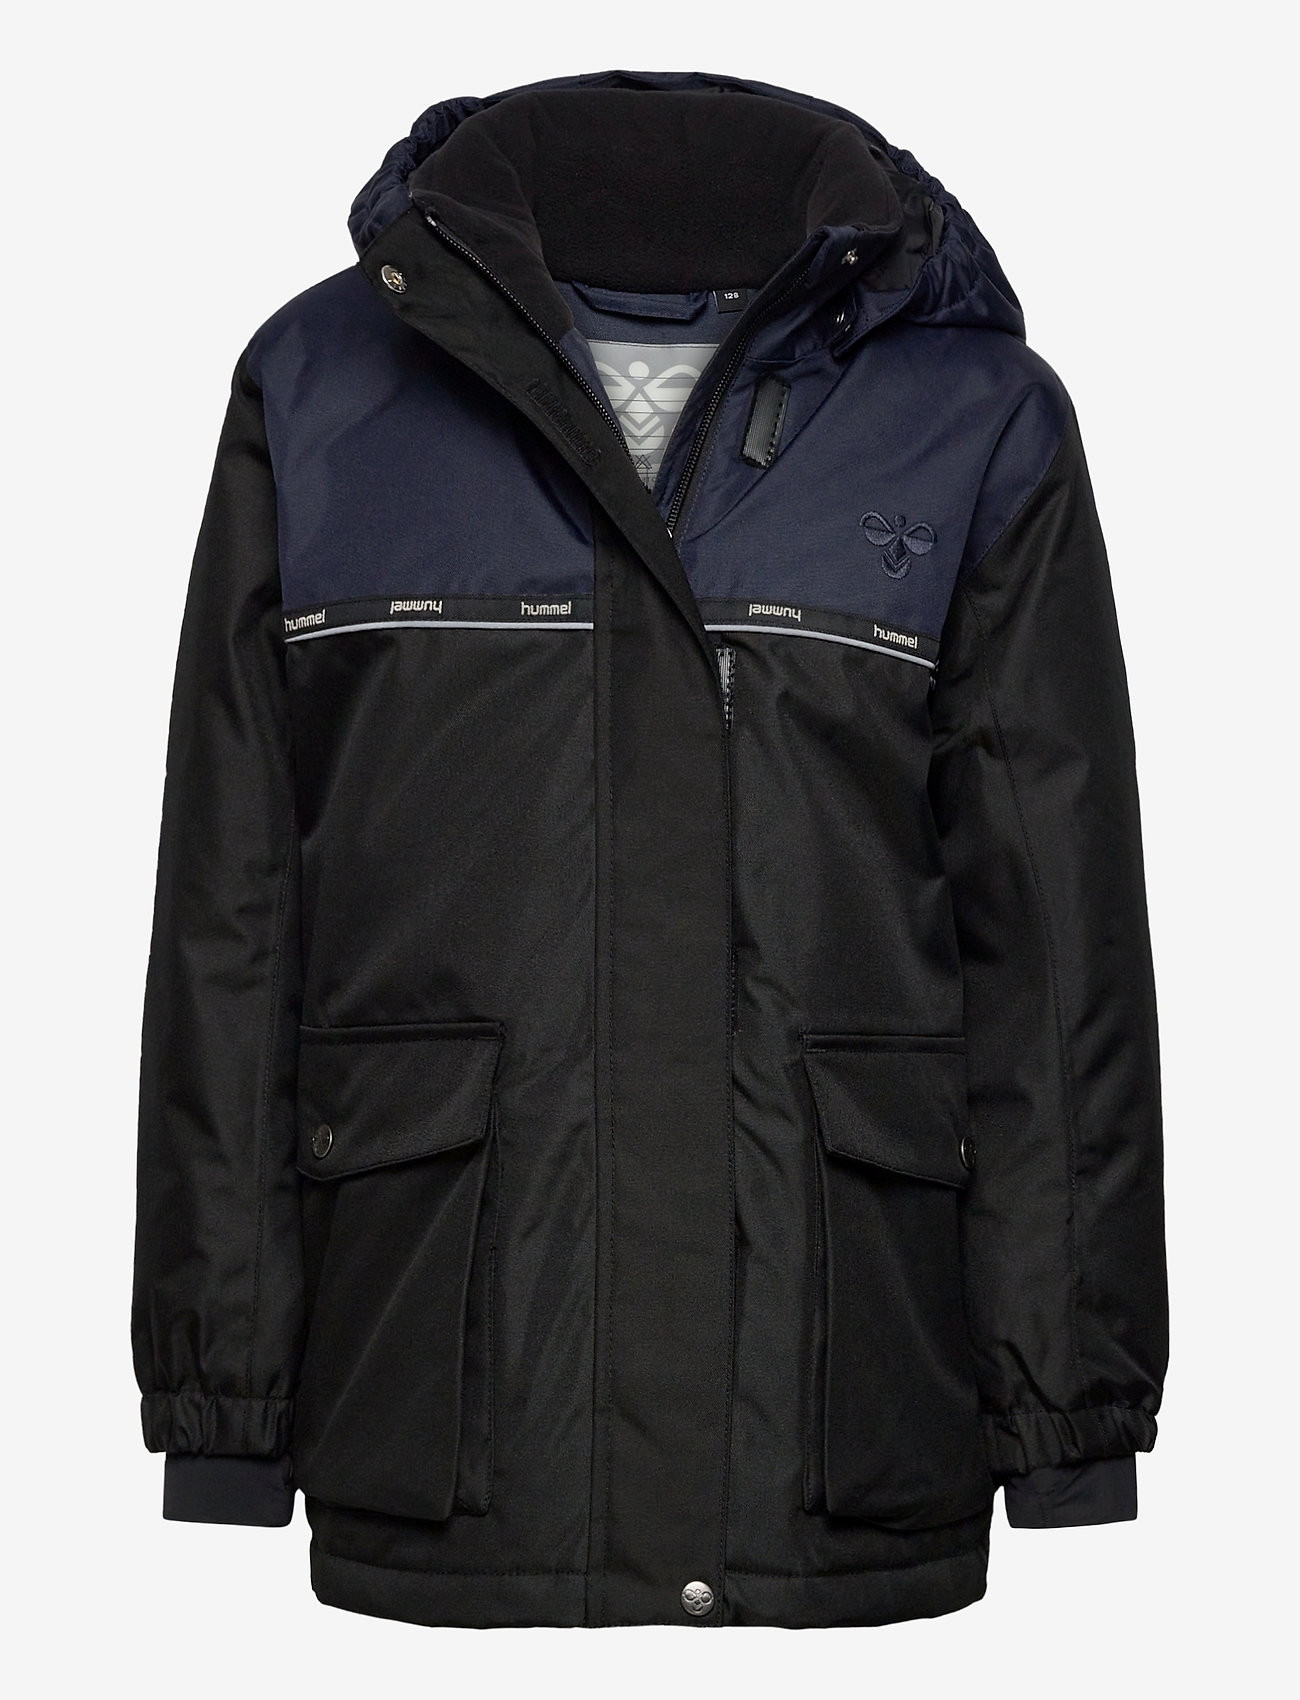 Hummel - hmlWEST JACKET - insulated jackets - black iris - 0